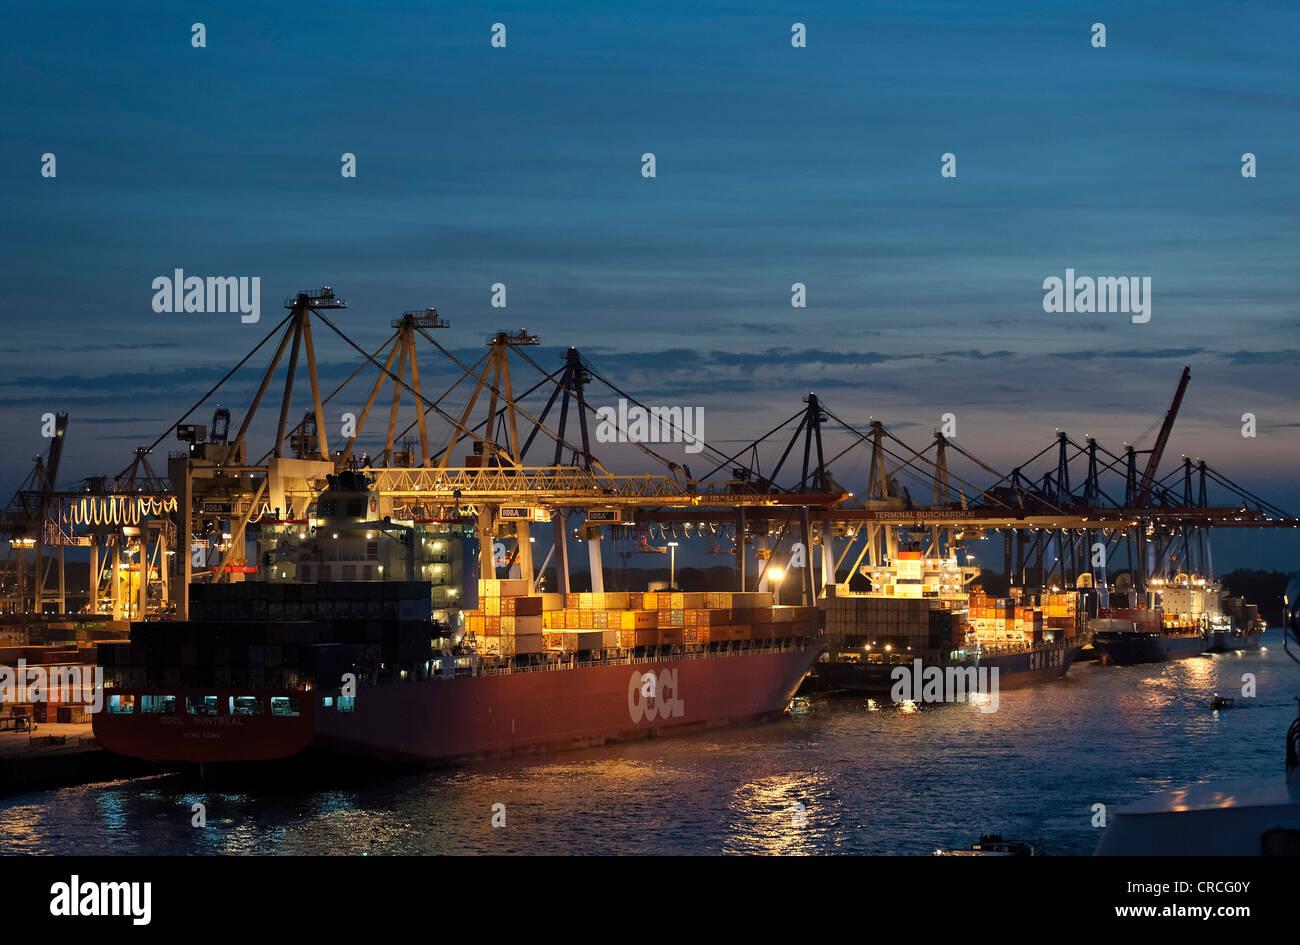 Cargo vessel OOCL Montreal in the Freeport of Hamburg, Elbe river, Hamburg, Germany, Europe - Stock Image